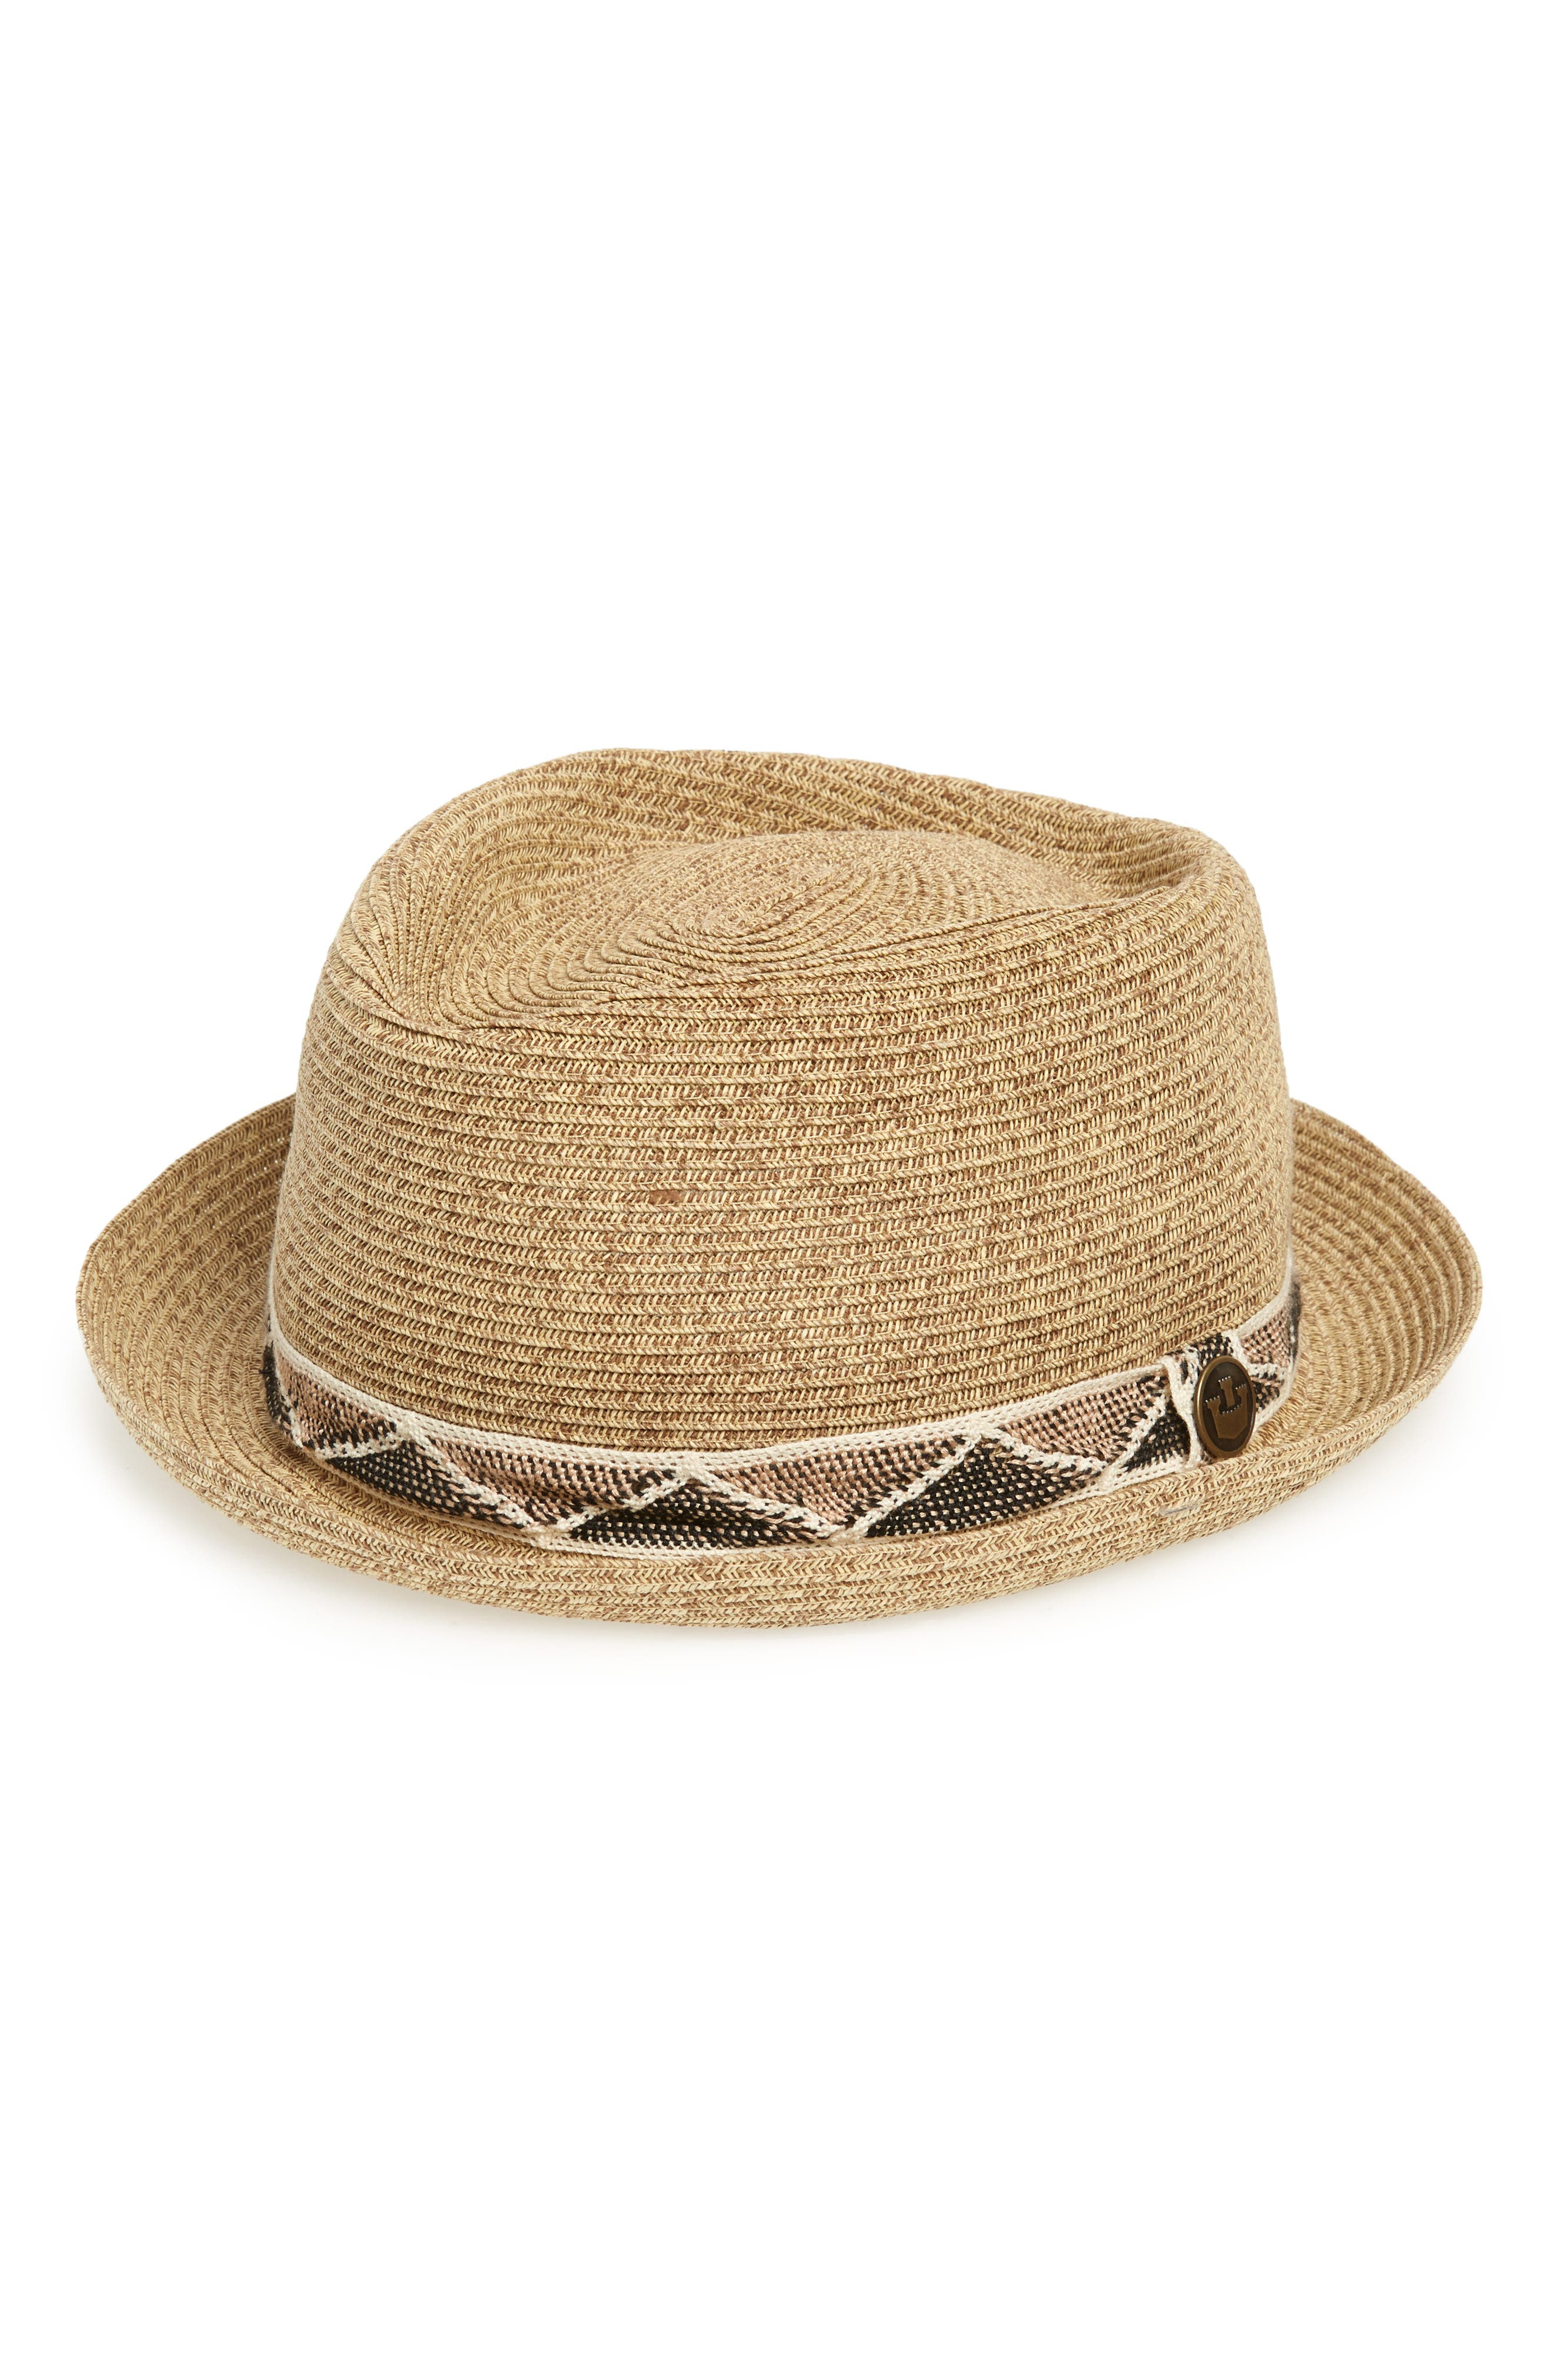 Albuquerque Straw Hat,                             Main thumbnail 1, color,                             201